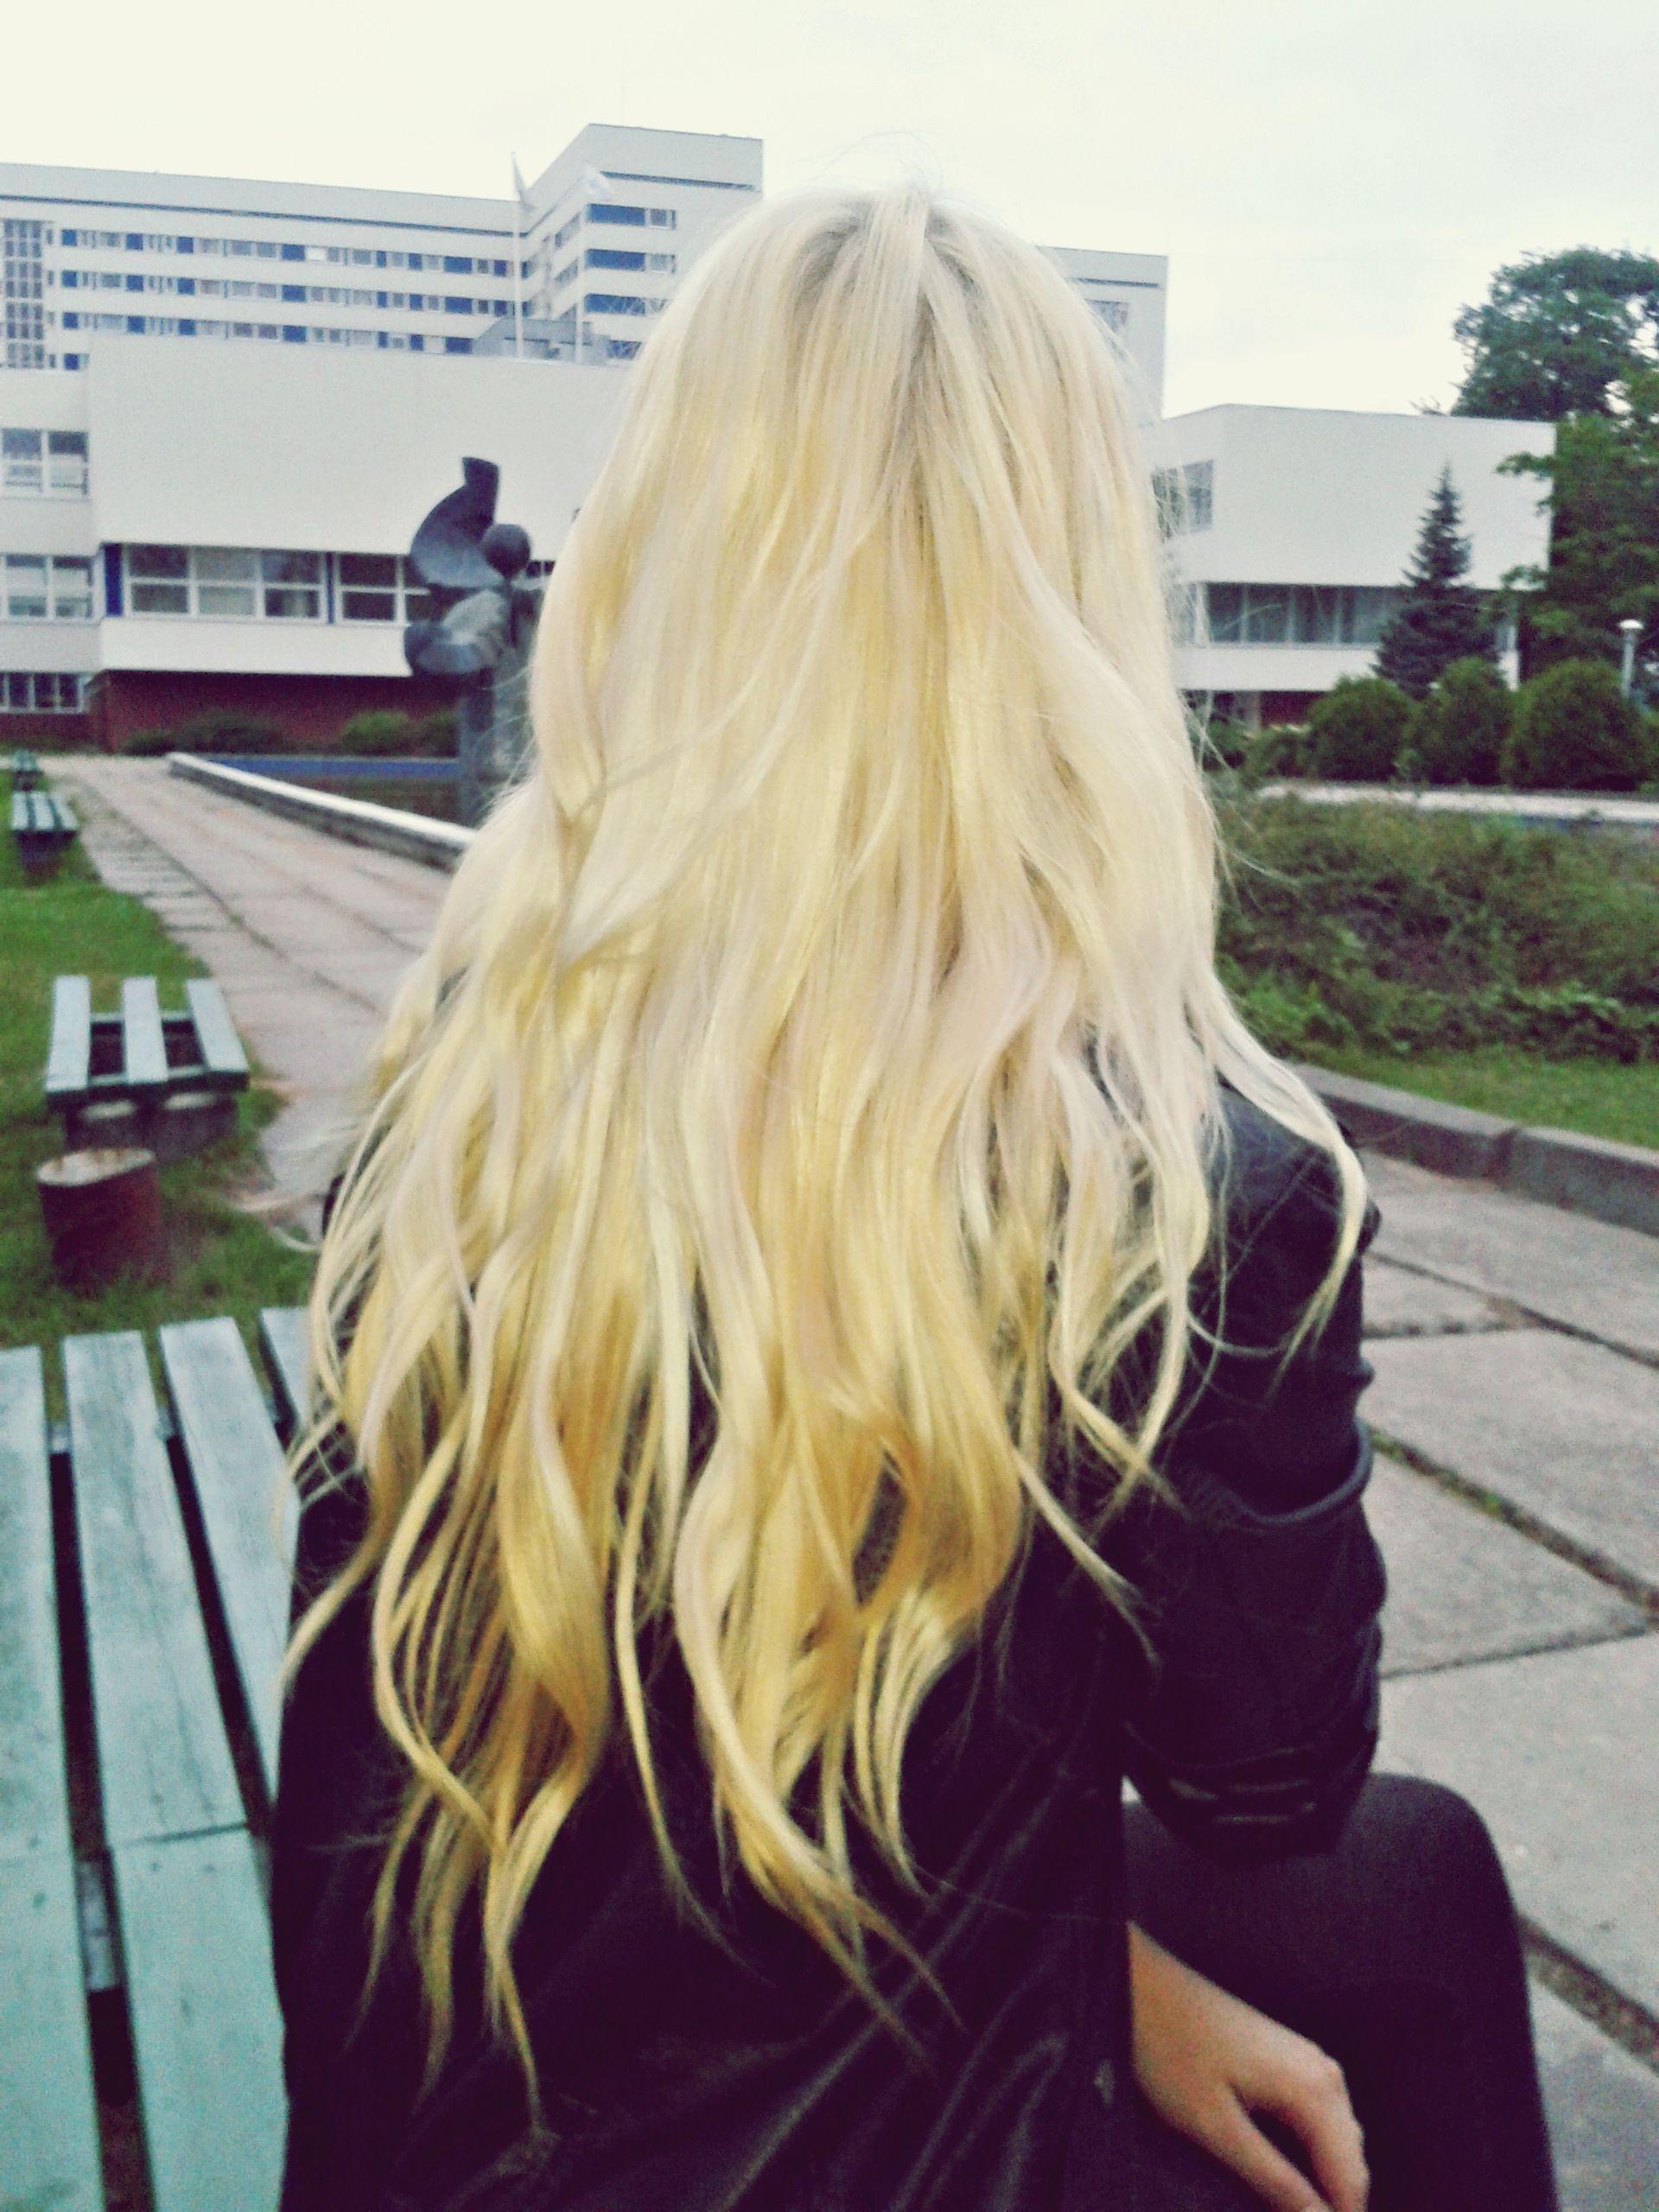 miss my long hair ;s <3 summer 2013, Riga, Latvia